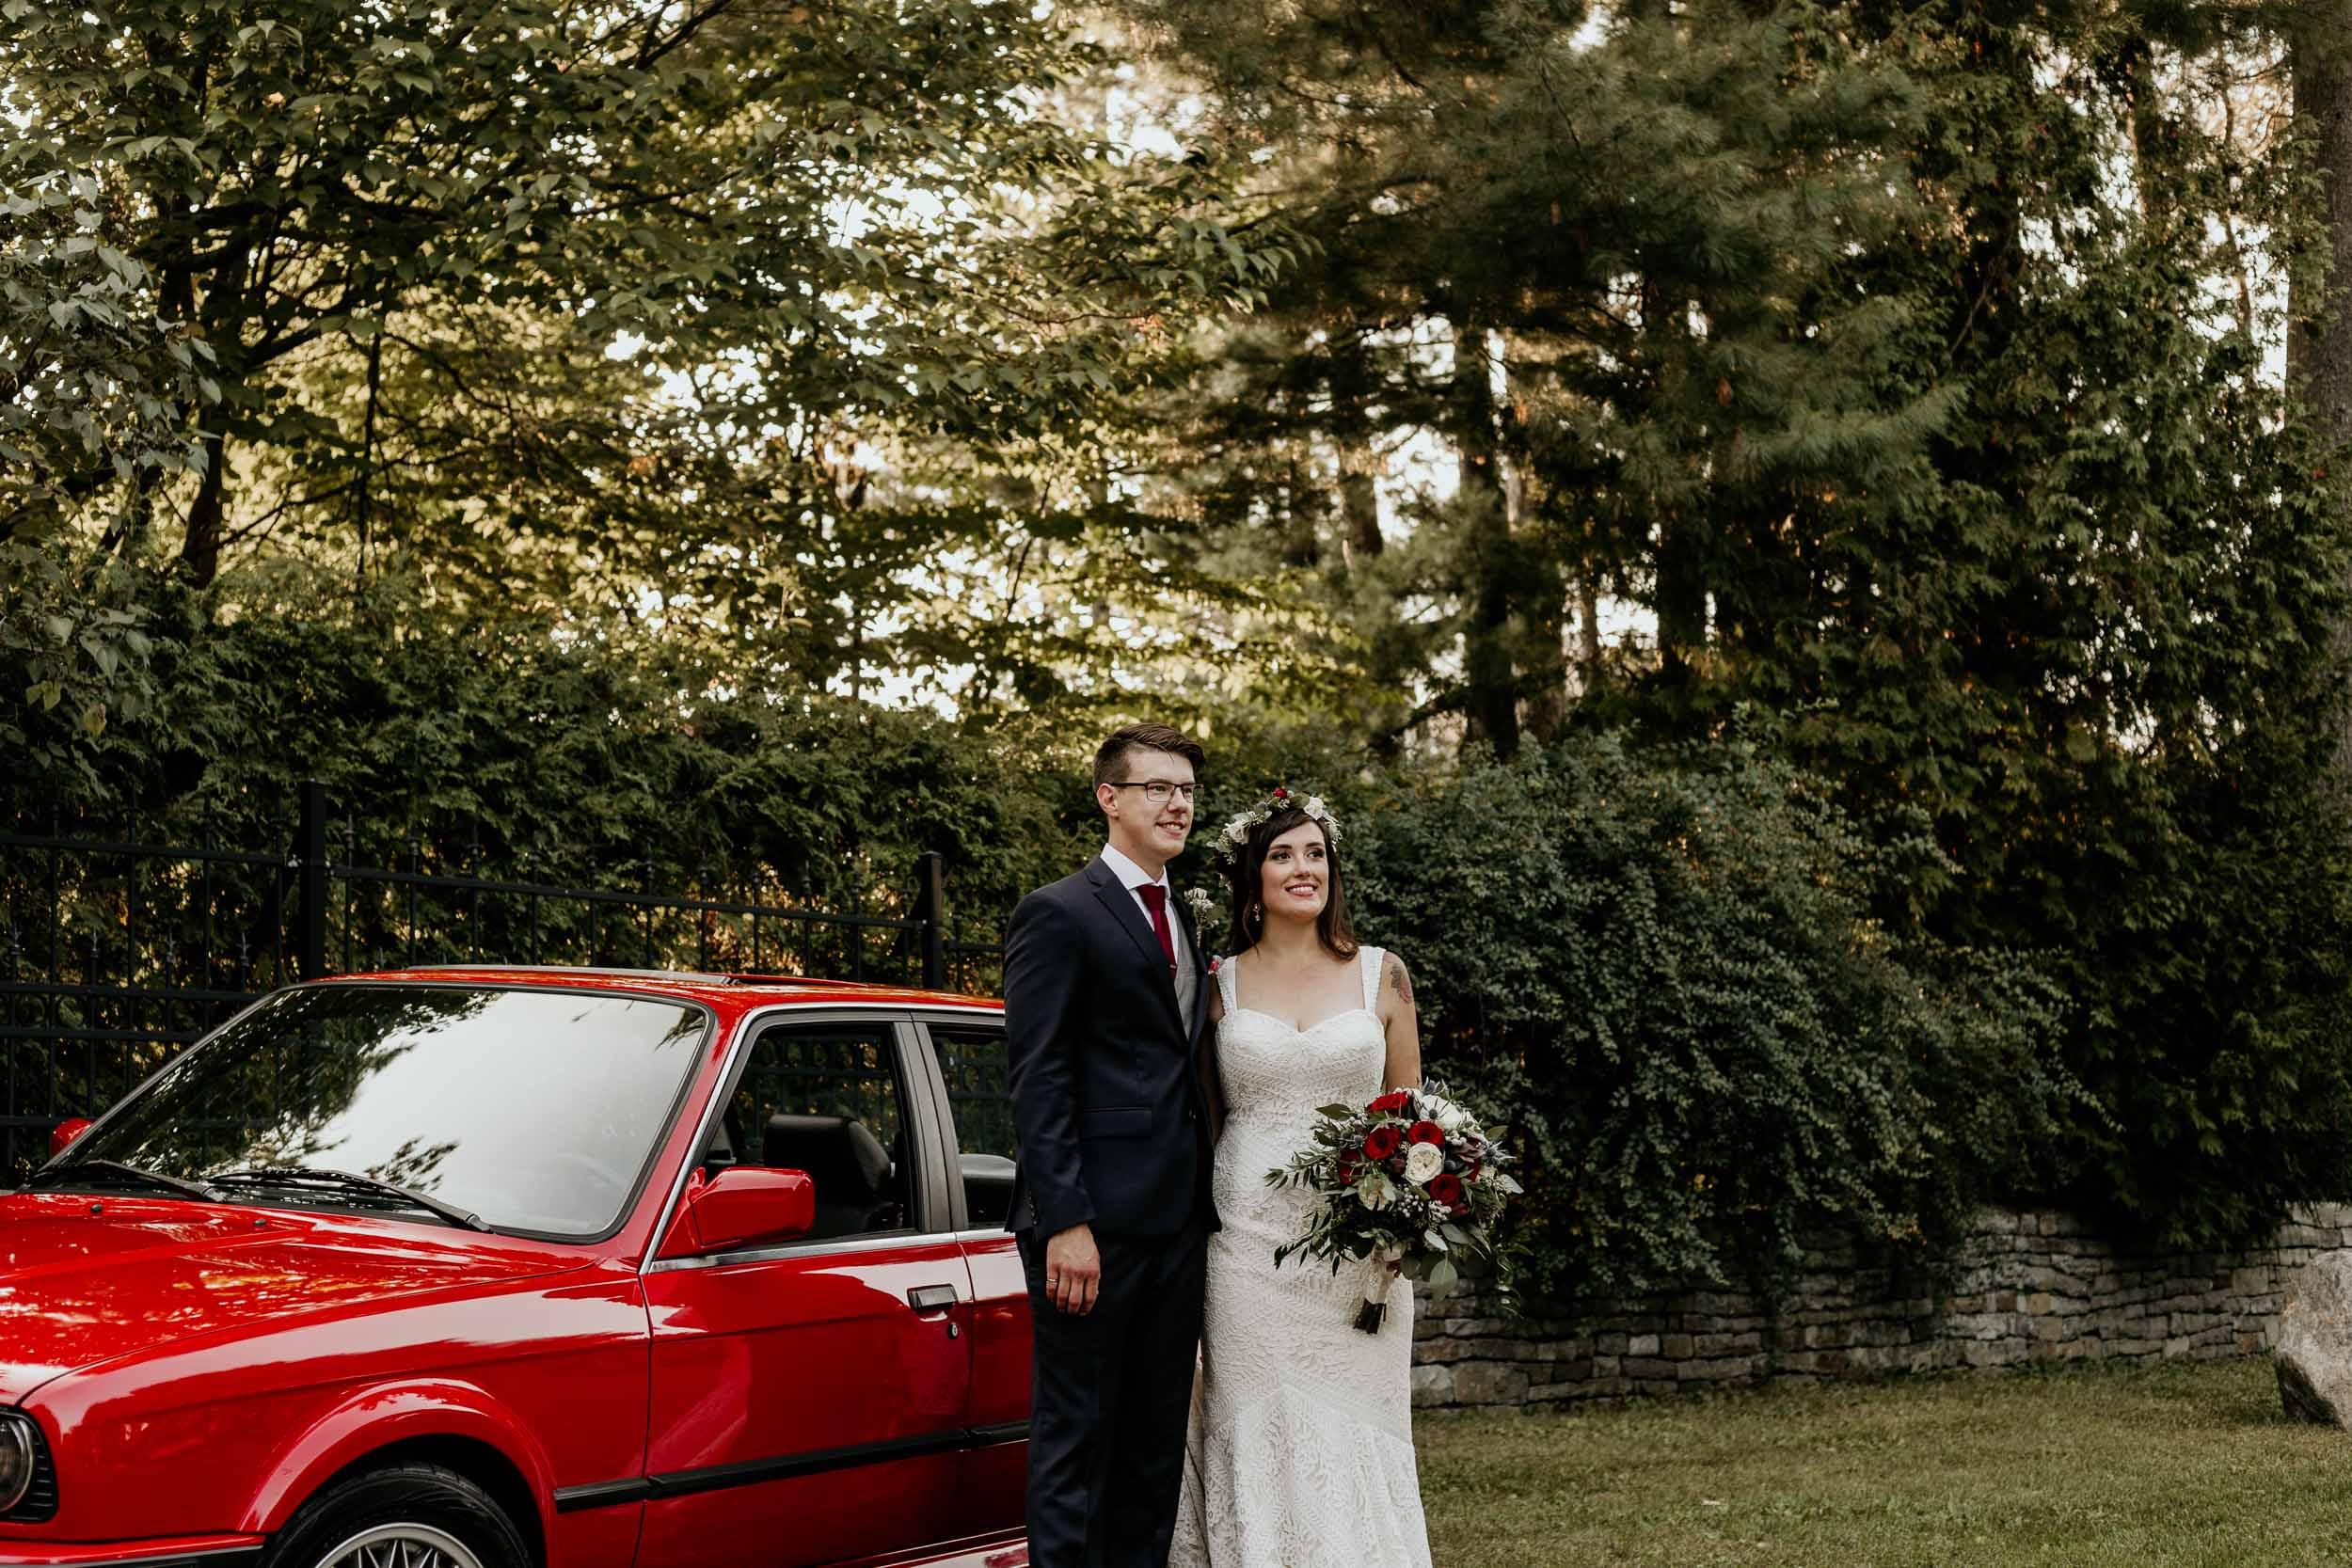 intimate-wedding-elopement-photographer-ottawa-toronto-8138.jpg